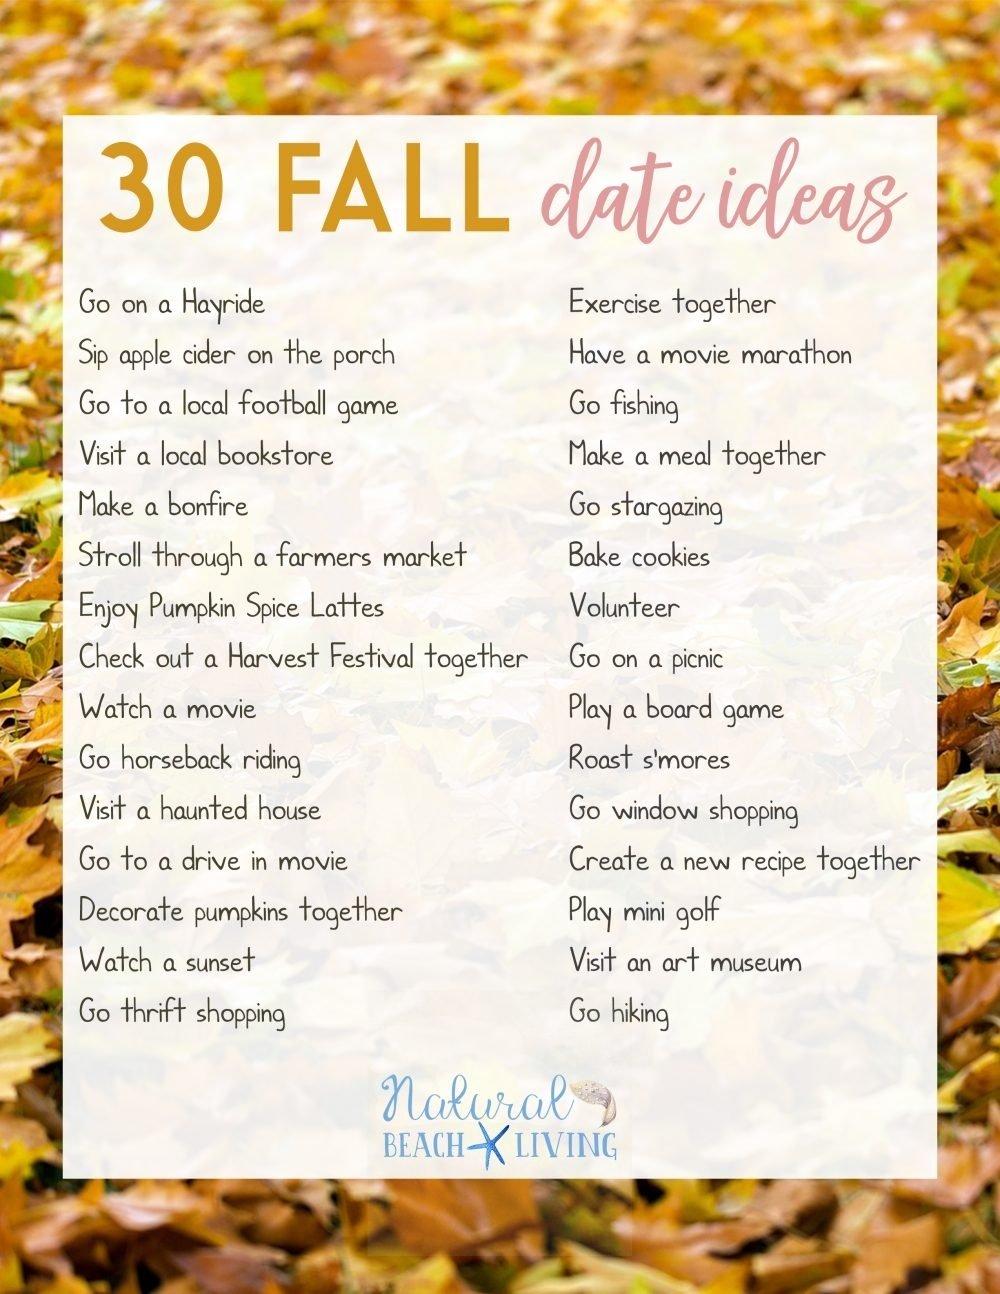 10 Famous Cheap Fun Date Night Ideas fun date night ideas for fall natural beach living 13 2021